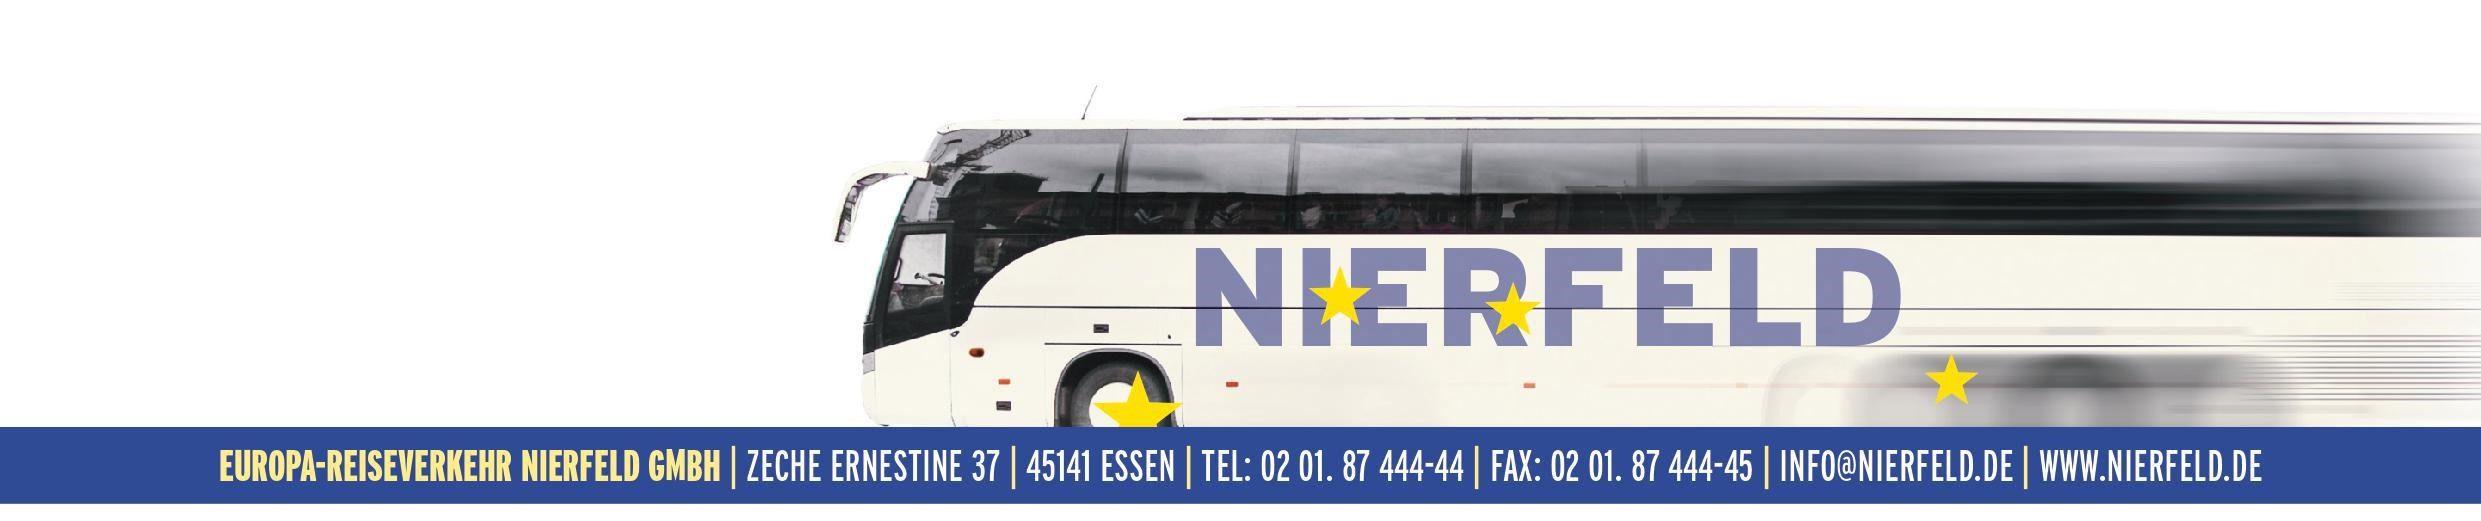 Europa-Reiseverkehr Nierfeld